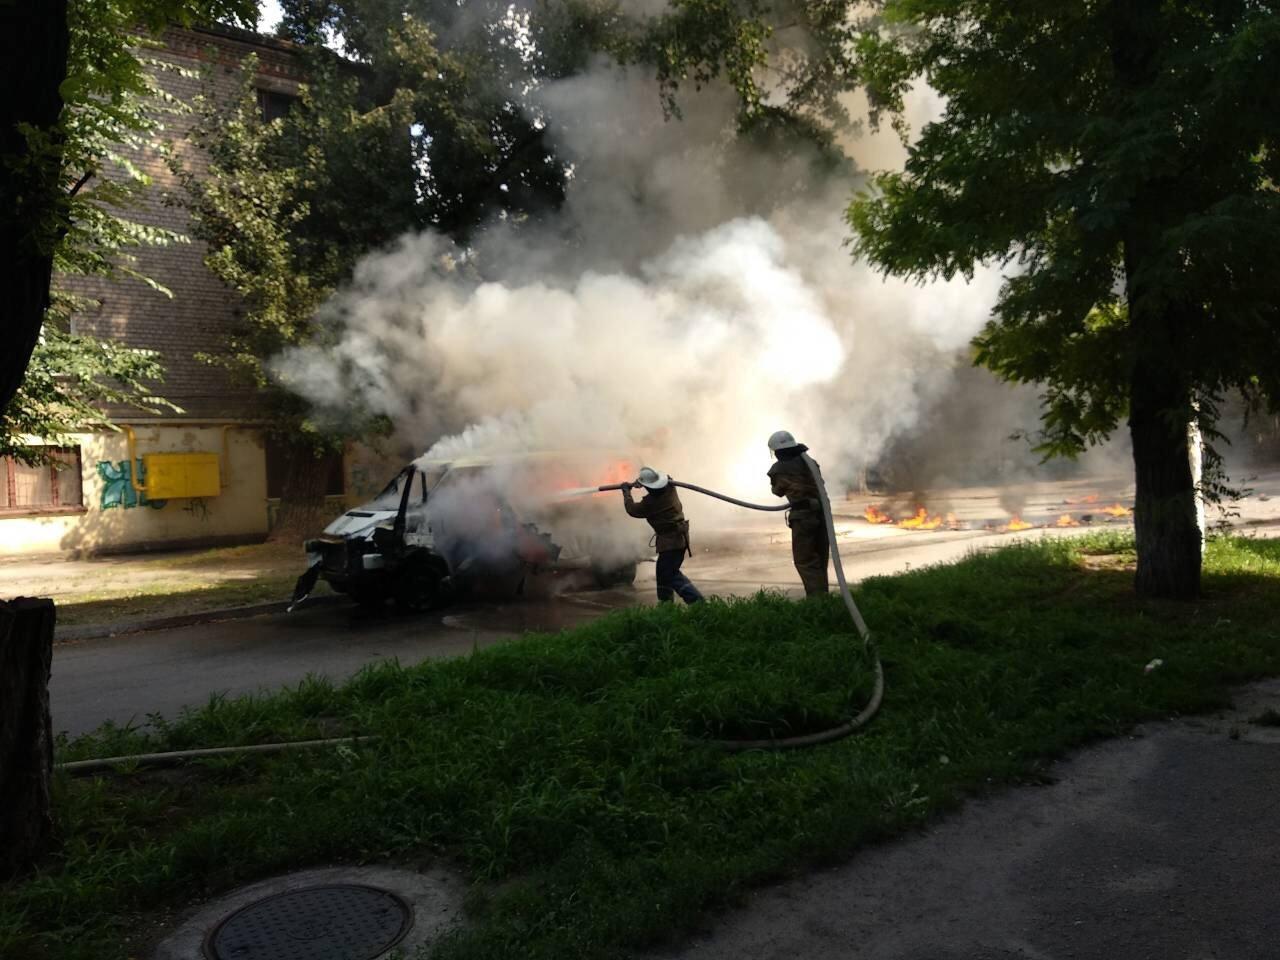 В Днепропетровской области взорвали машину: внутри находился депутат горсовета, - ФОТО, фото-6